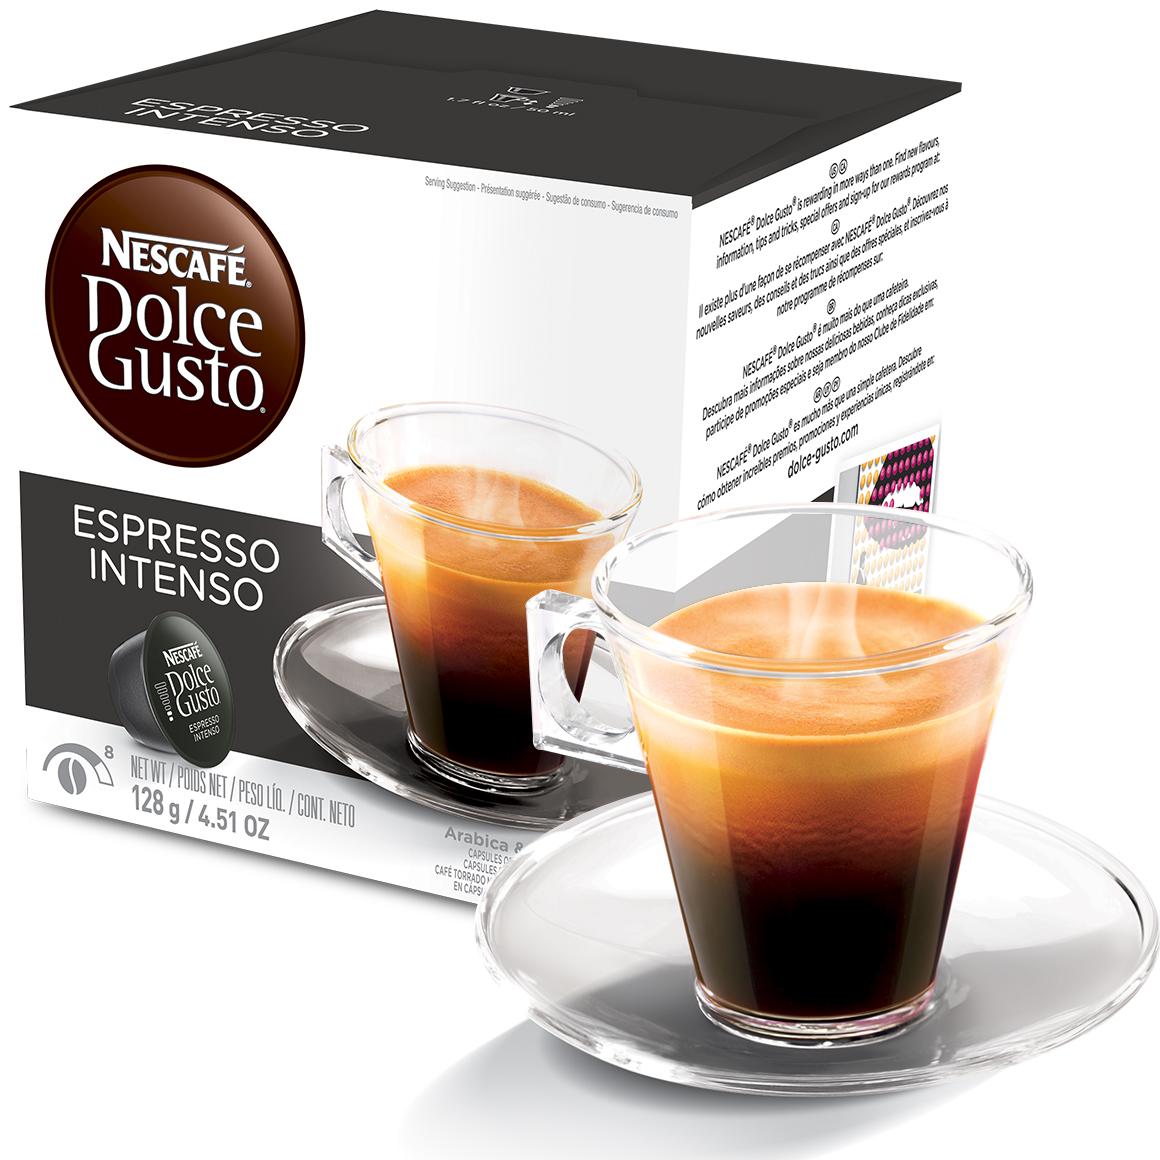 Cápsula Nescafé Dolce Gusto Café Espresso Intenso 16 Cápsulas...